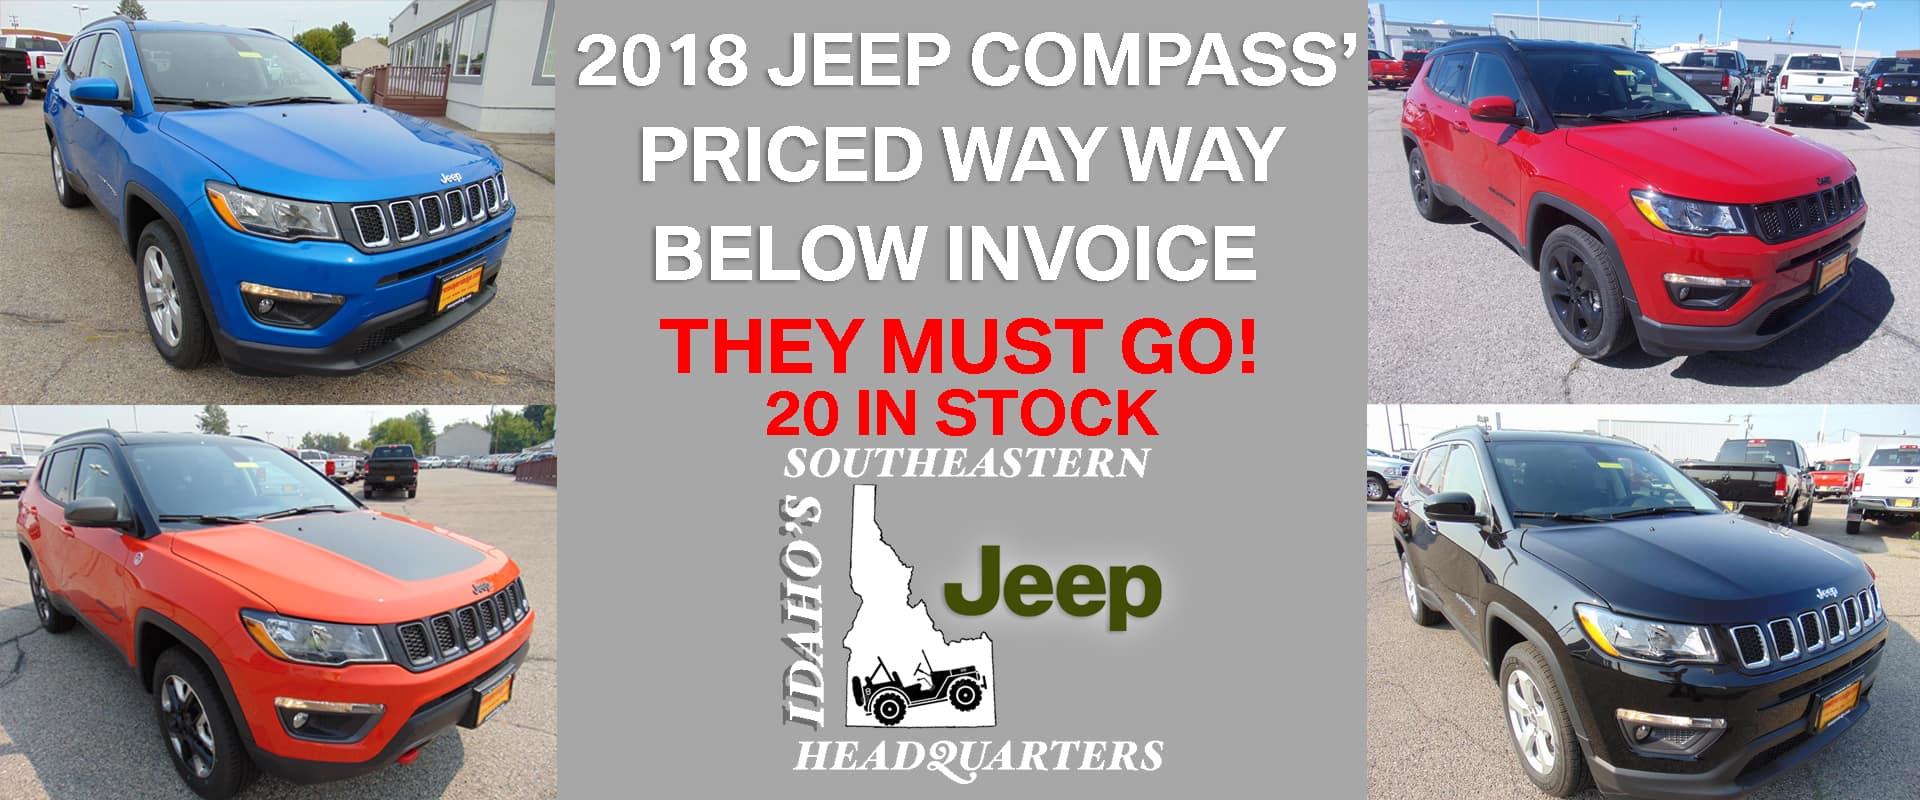 Ron Sayer S Chrysler Jeep Dodge Cdjr Dealer In Idaho Falls Id